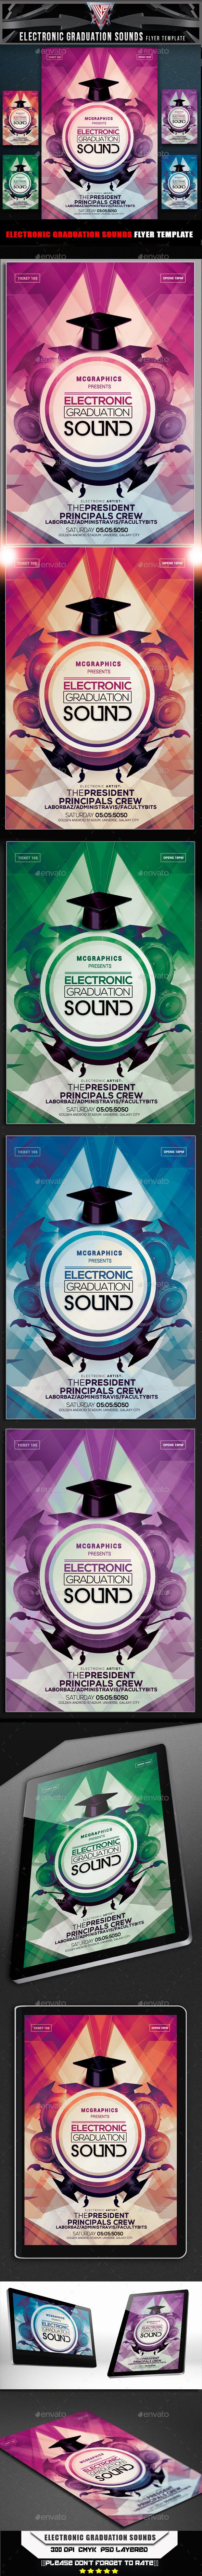 Electronic Graduation Sounds Flyer Template - Events Flyers